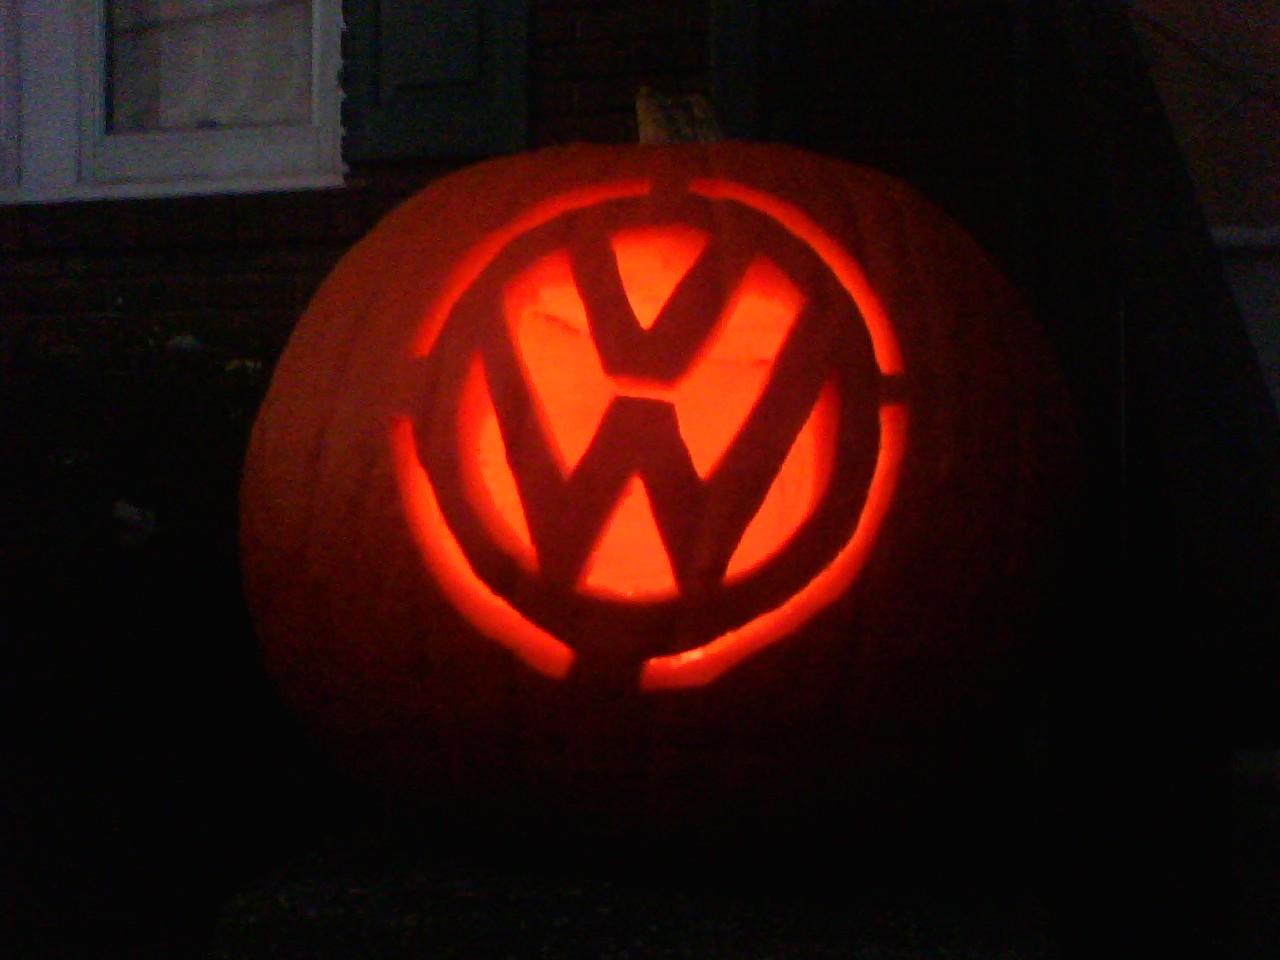 Halloween vw campervan pumpkin carving vw camper hire